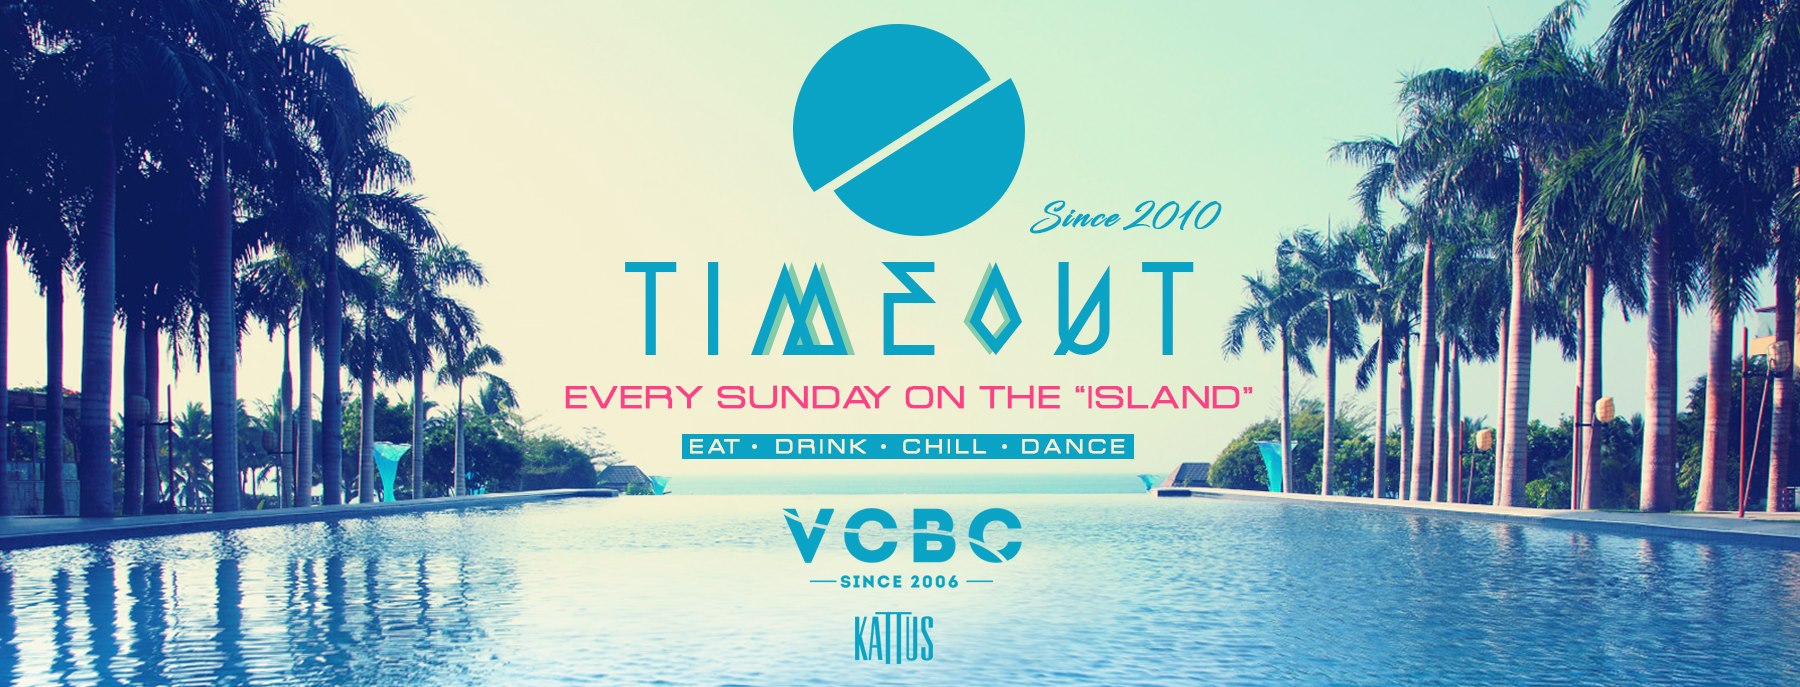 Events Wien: Timeout